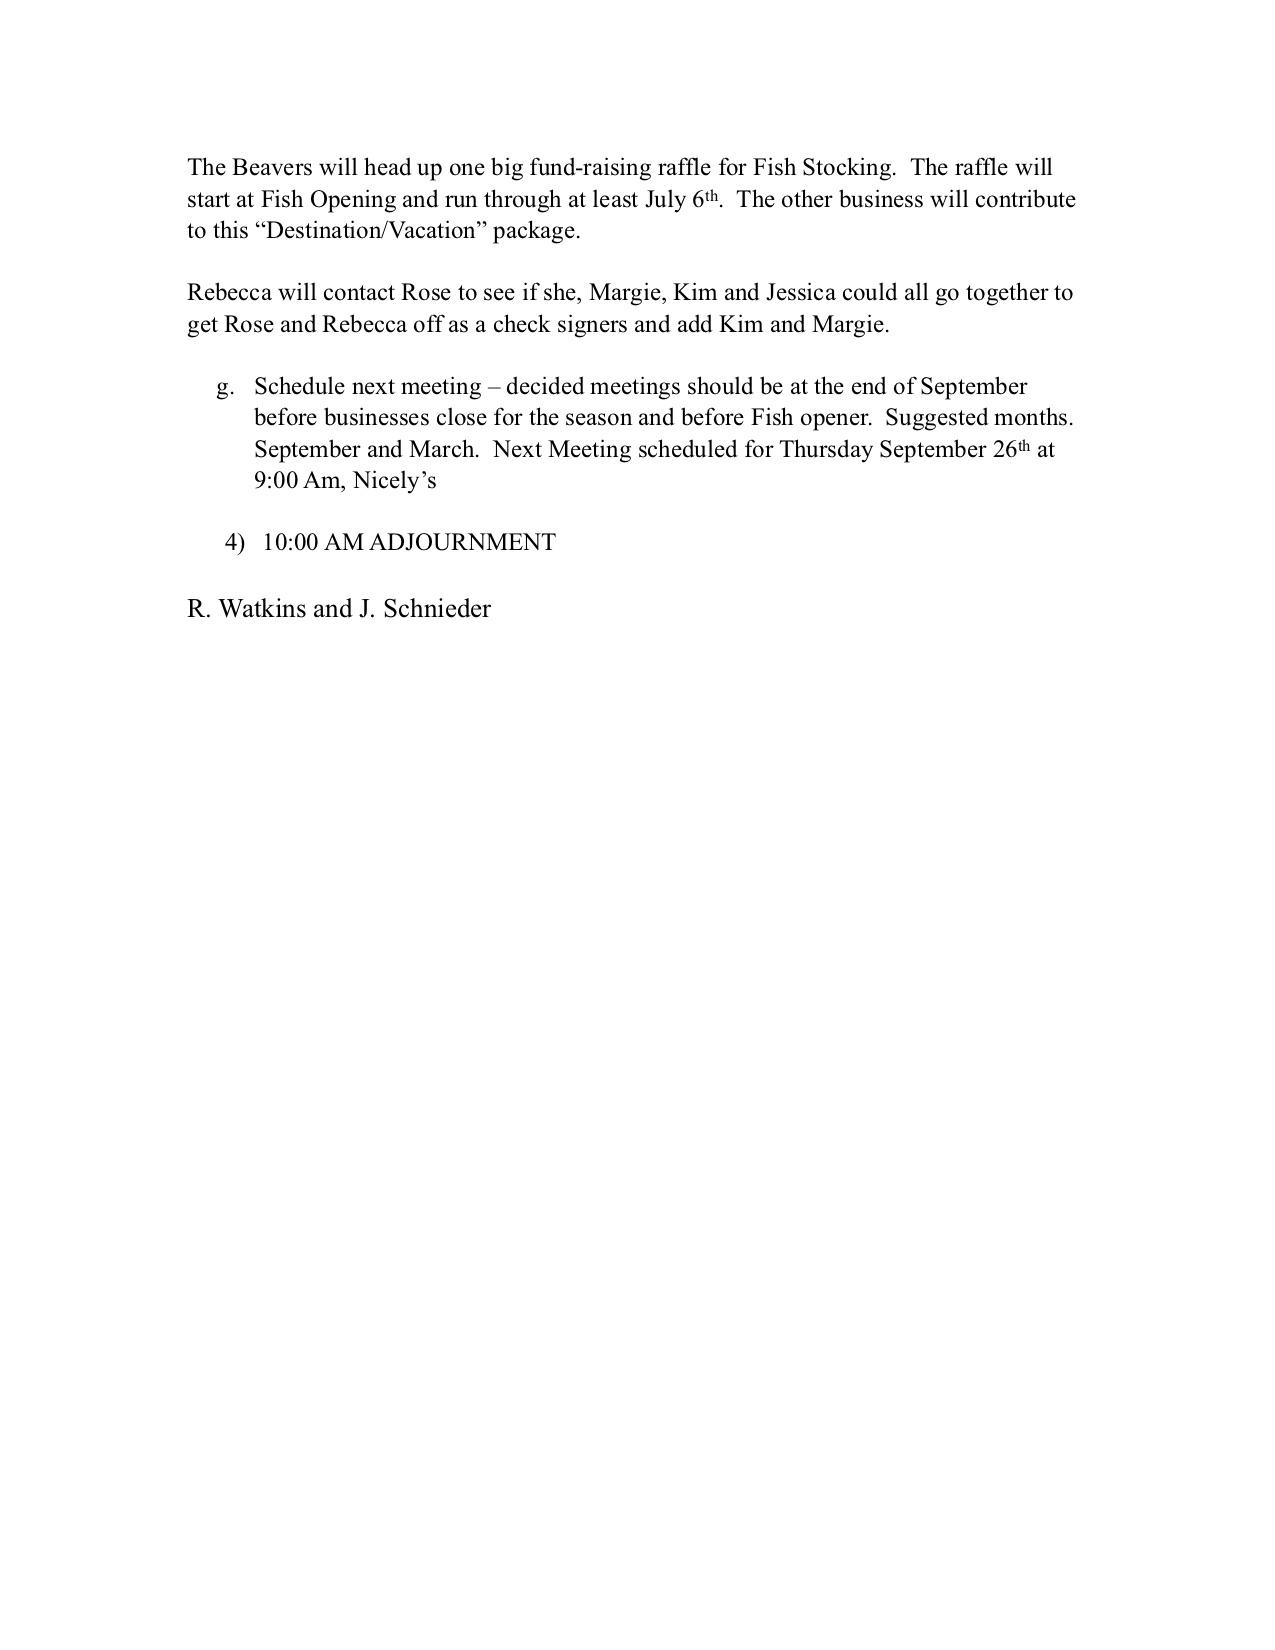 LVCC Minutes3 - April 2019.jpg